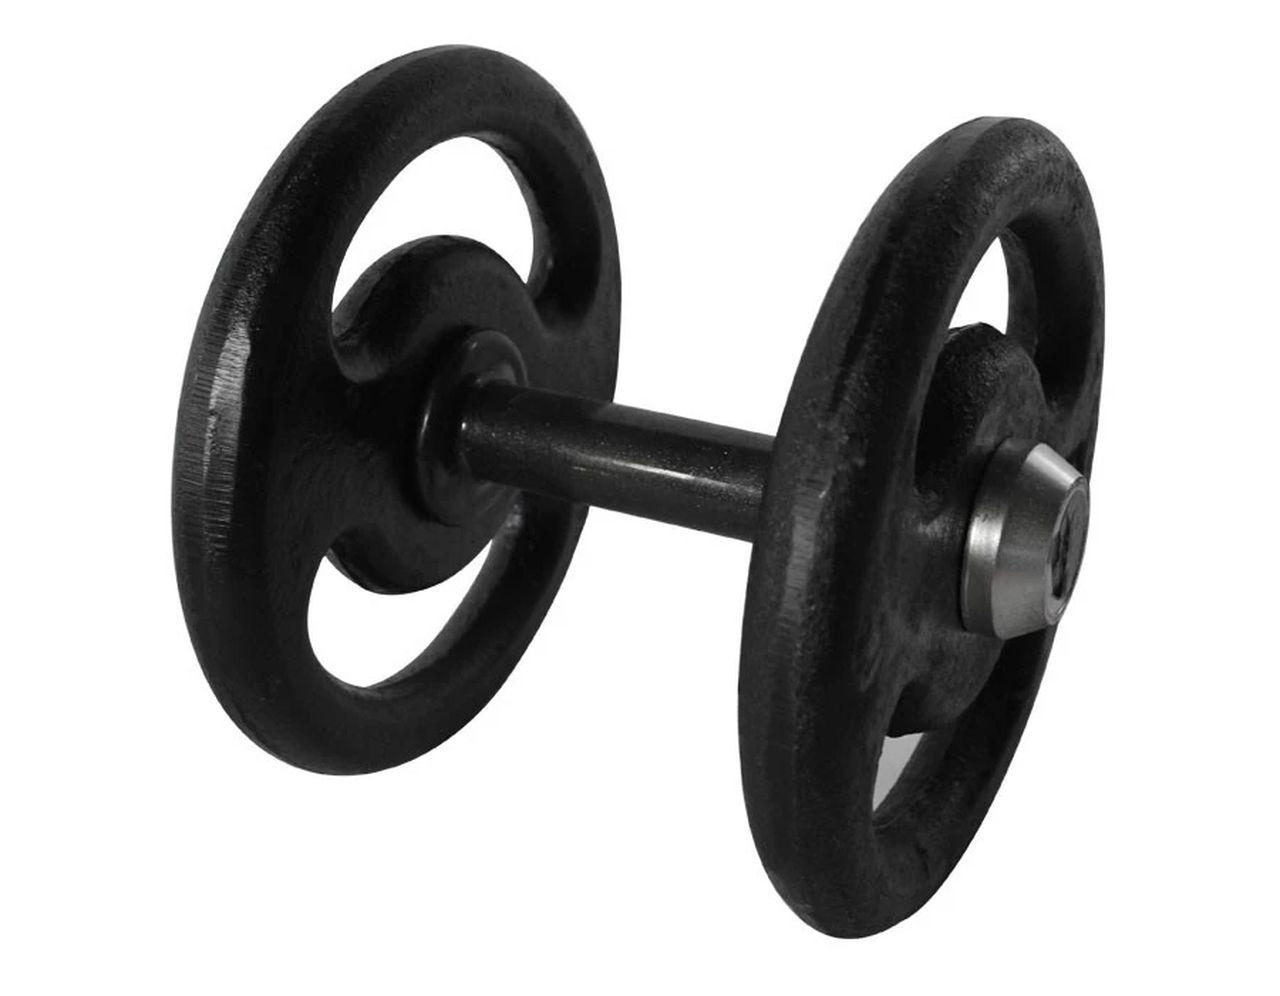 Dumbbell Pintado Pegada Emborrachada Academia Fitness 12kg  - Panela de Ferro Fundido